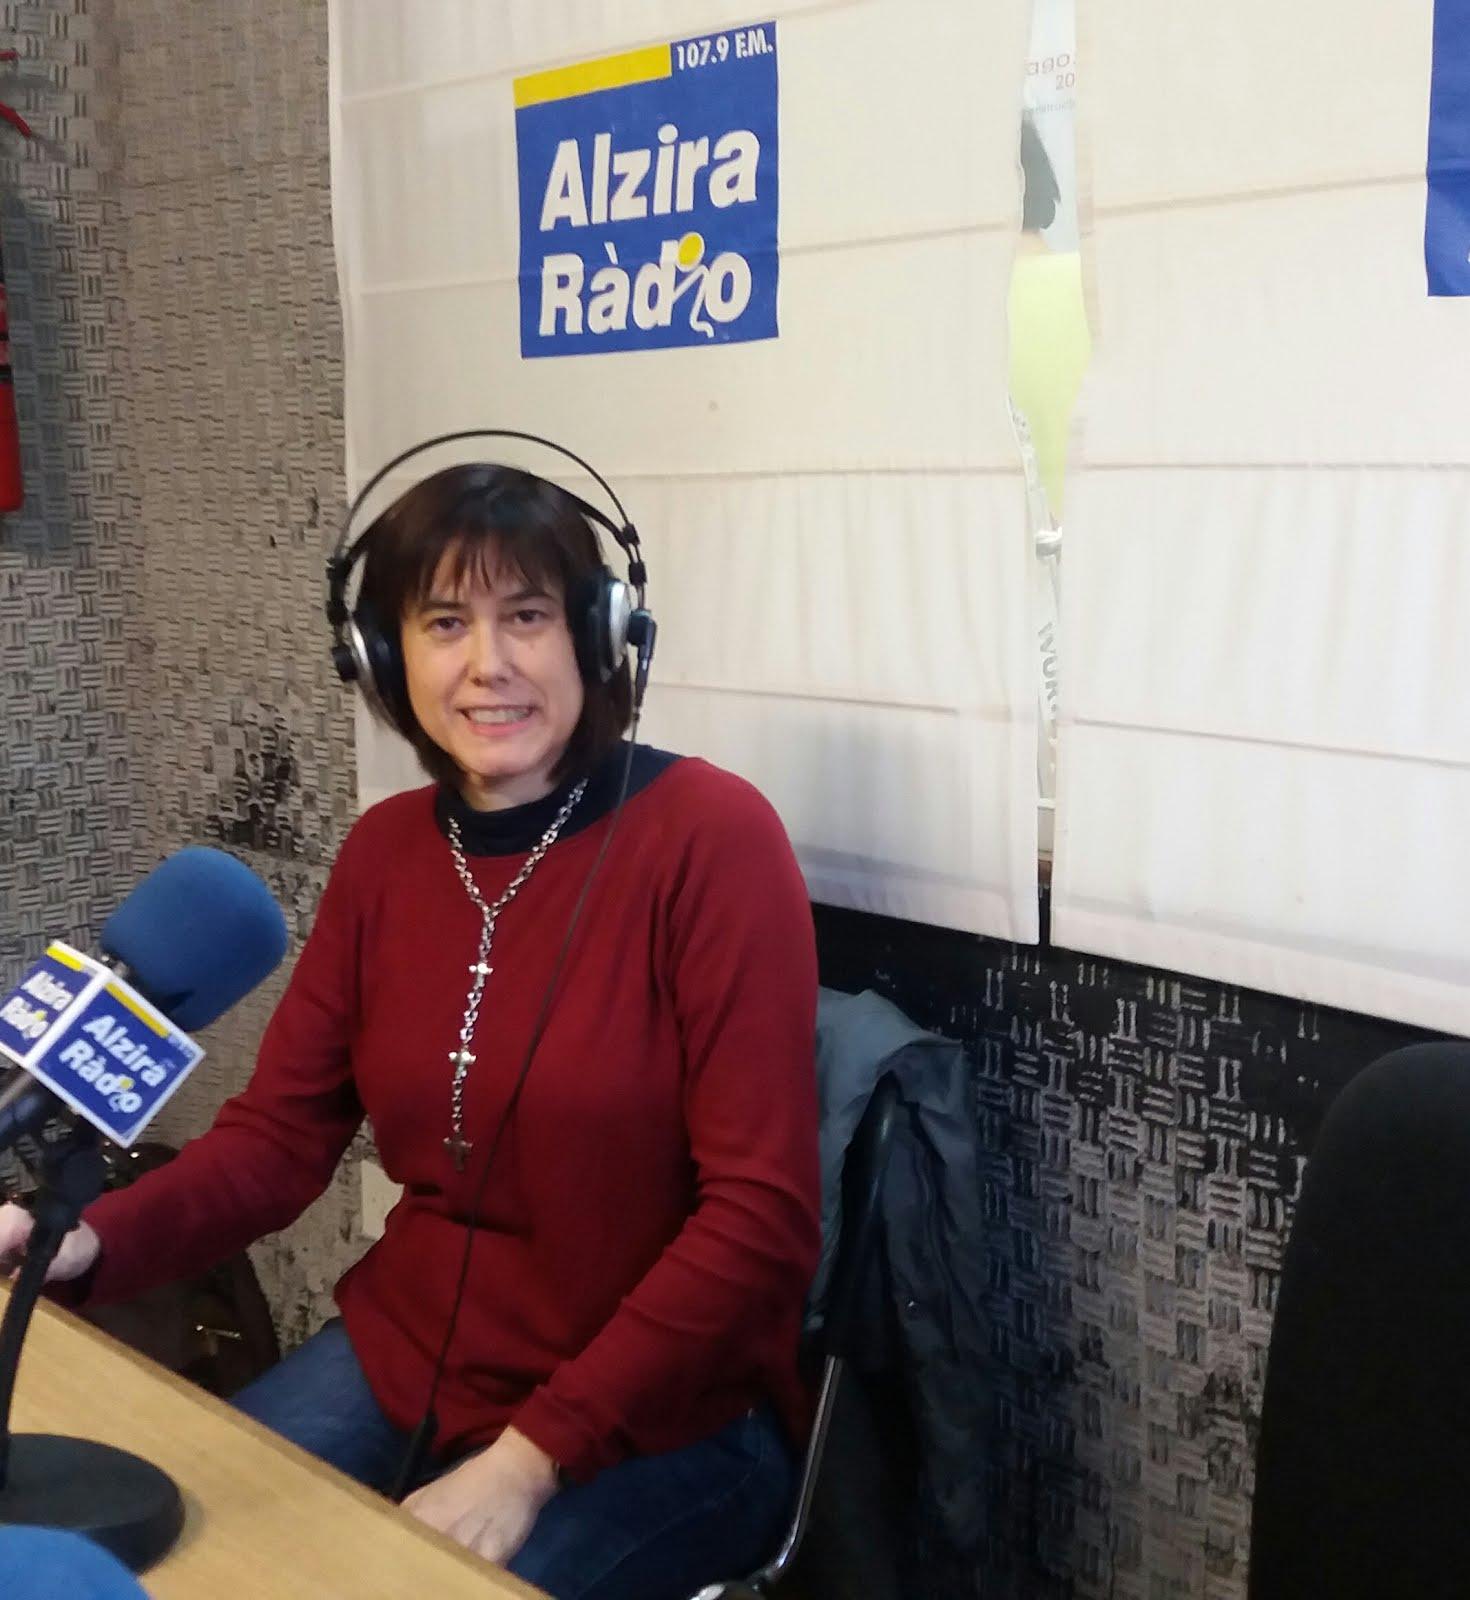 Convidada a Alzira ràdio